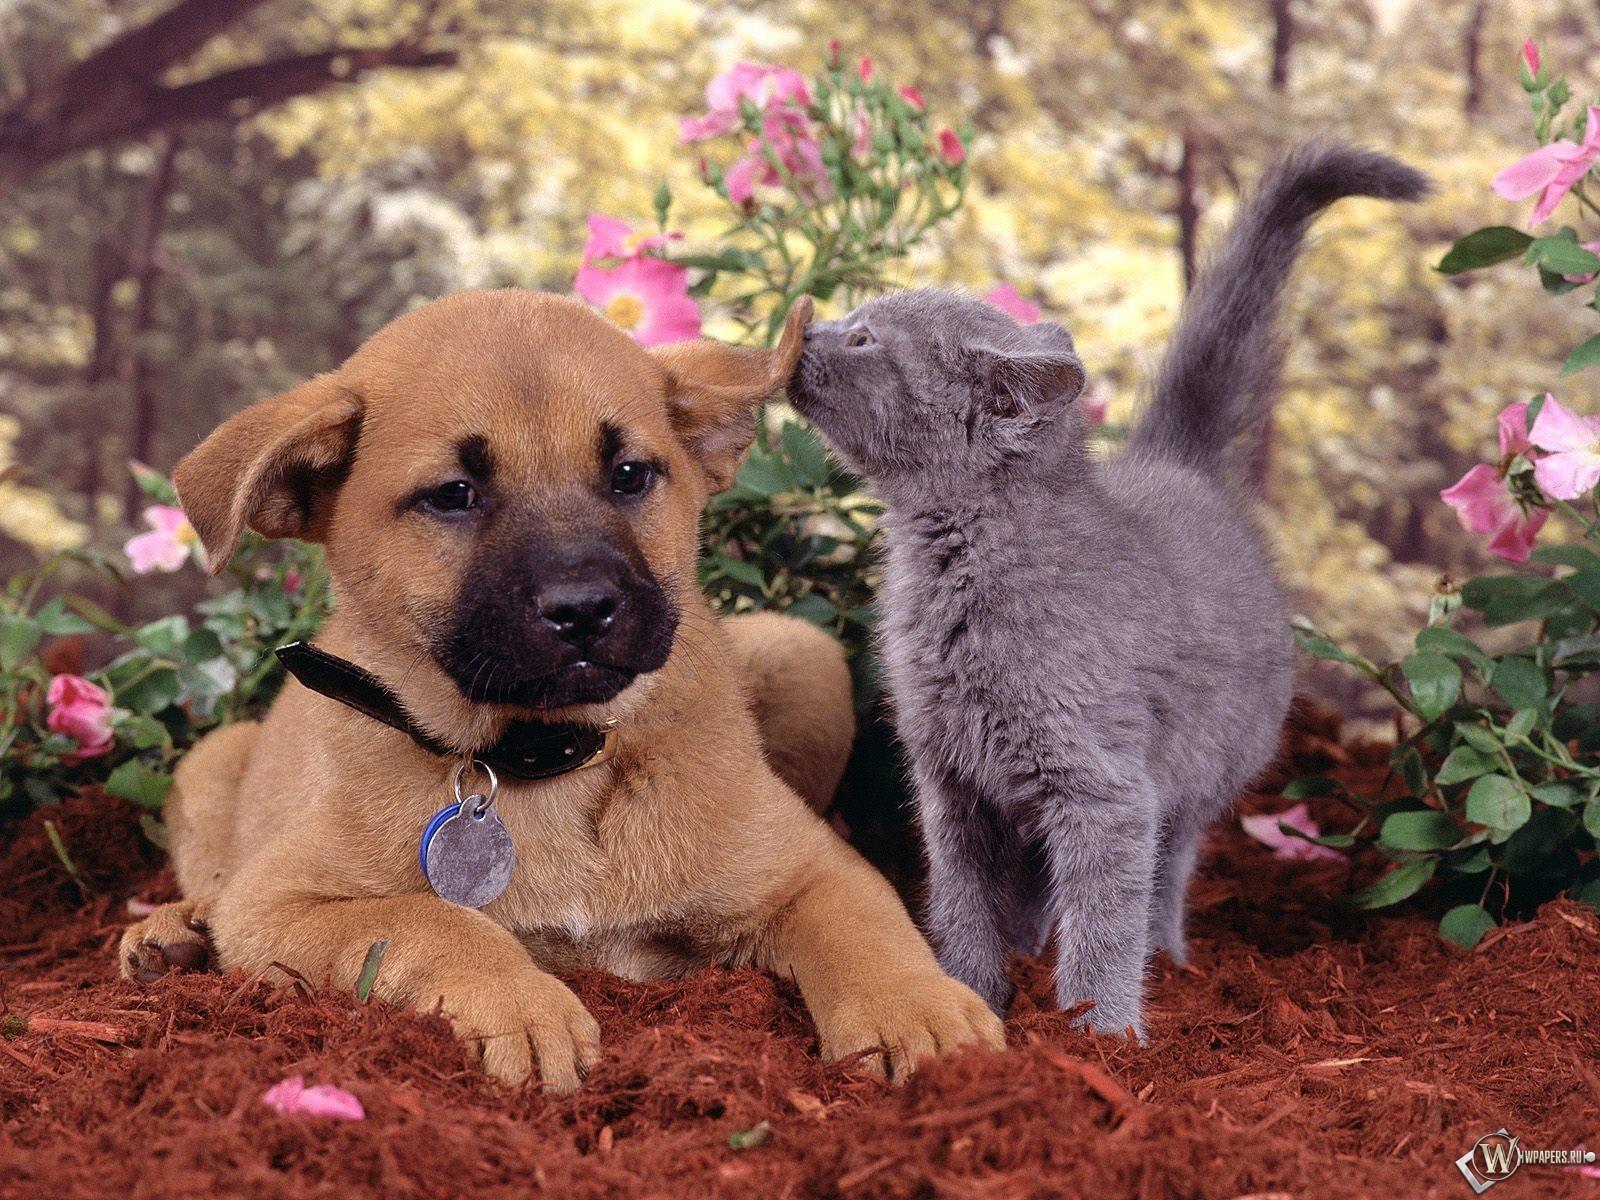 Котенок нюхает ухо щенка 1600x1200